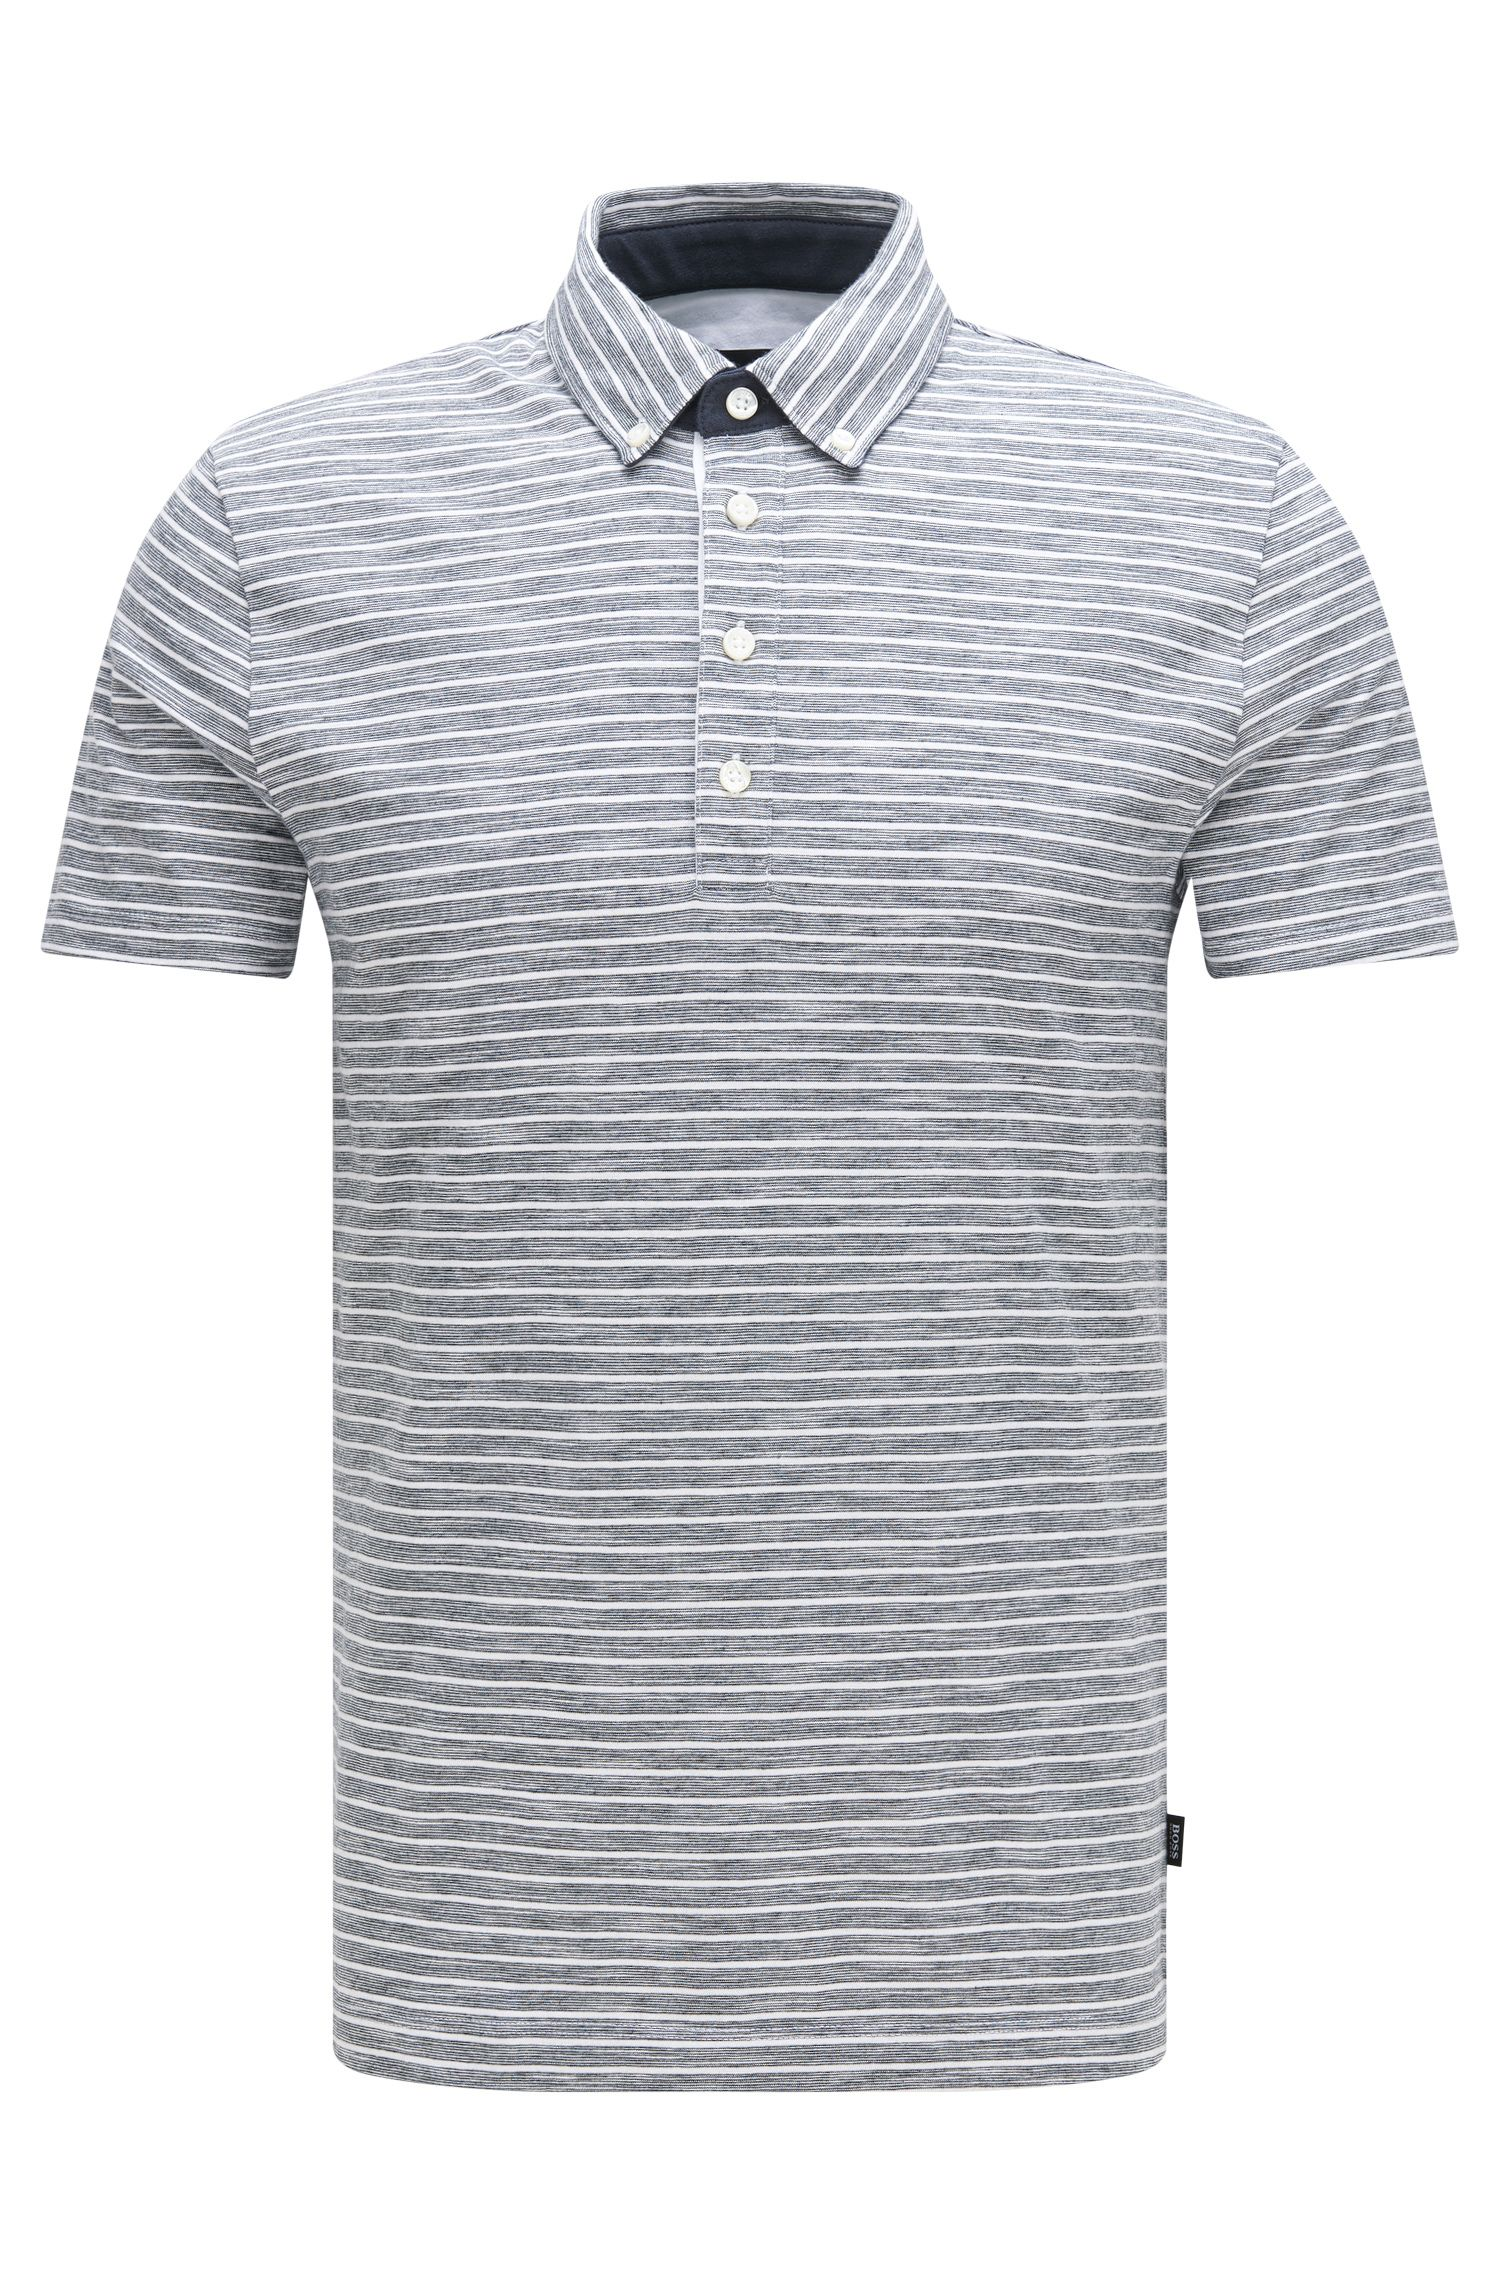 Gestreiftes Slim-Fit Poloshirt aus Baumwoll-Mix: 'Platt 08'